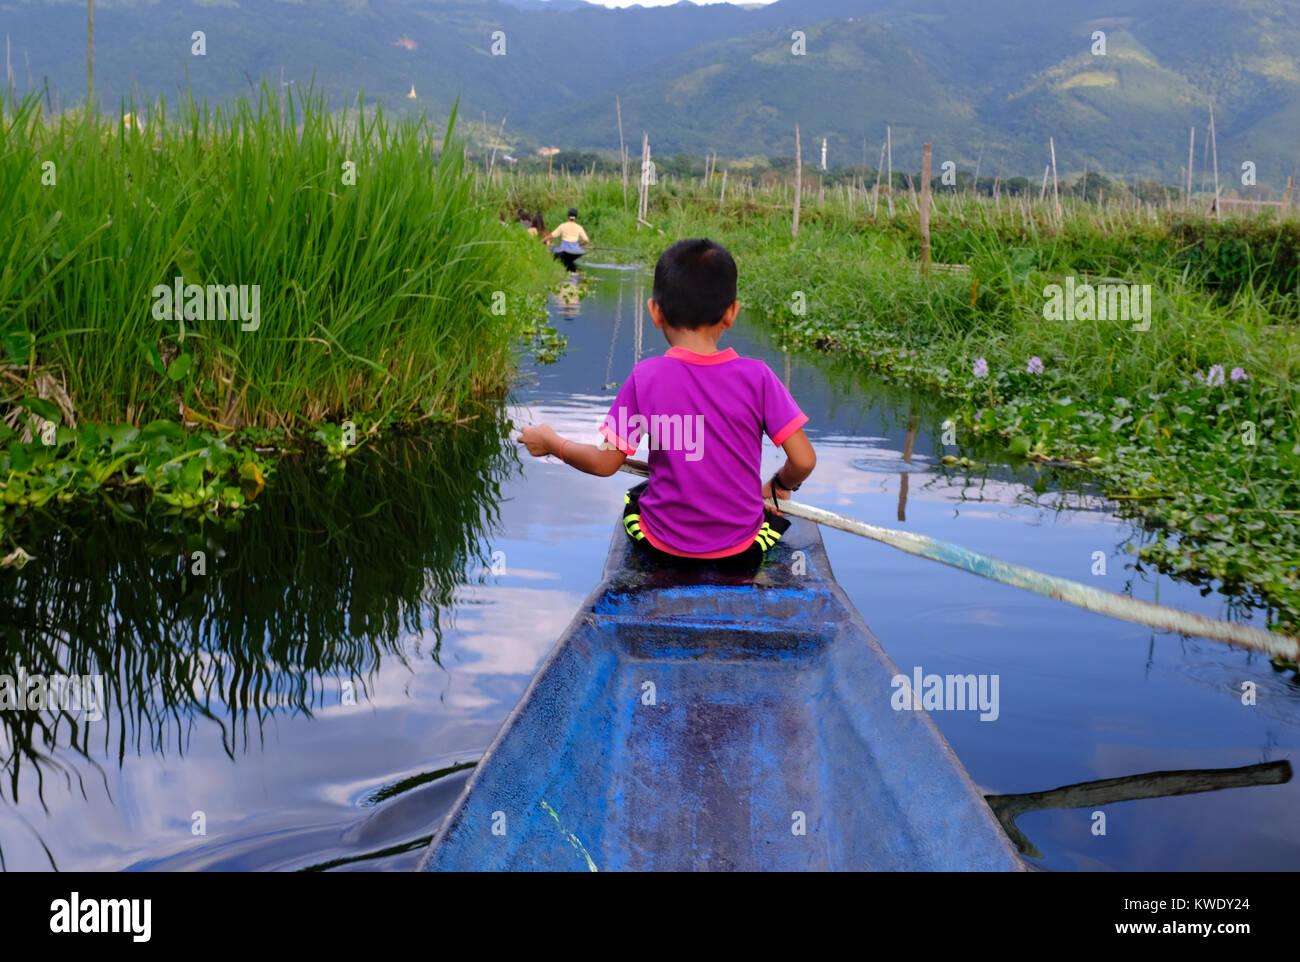 Little boy guiding long boat on Inle Lake, Myanmar - Stock Image